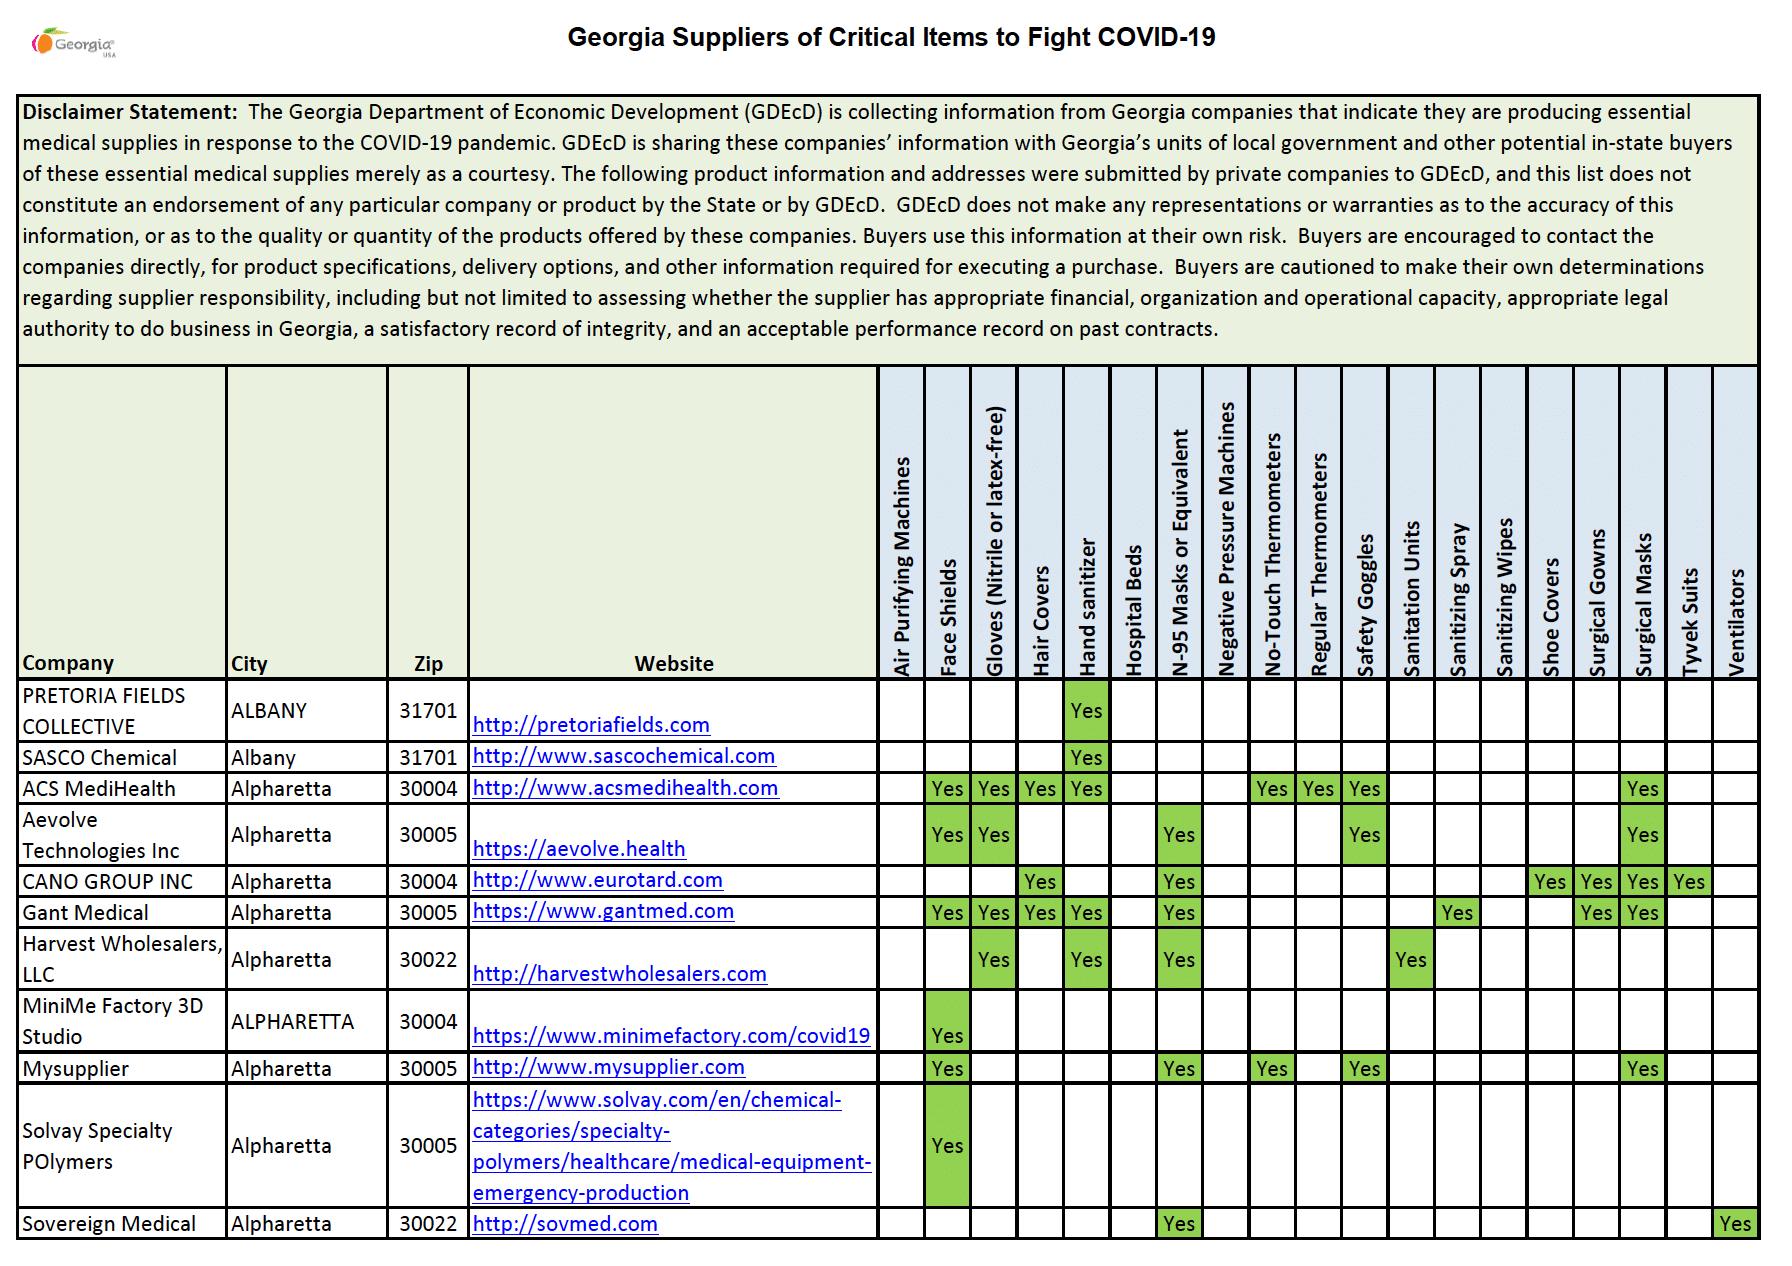 List of Georgia Suppliers Providing PPE